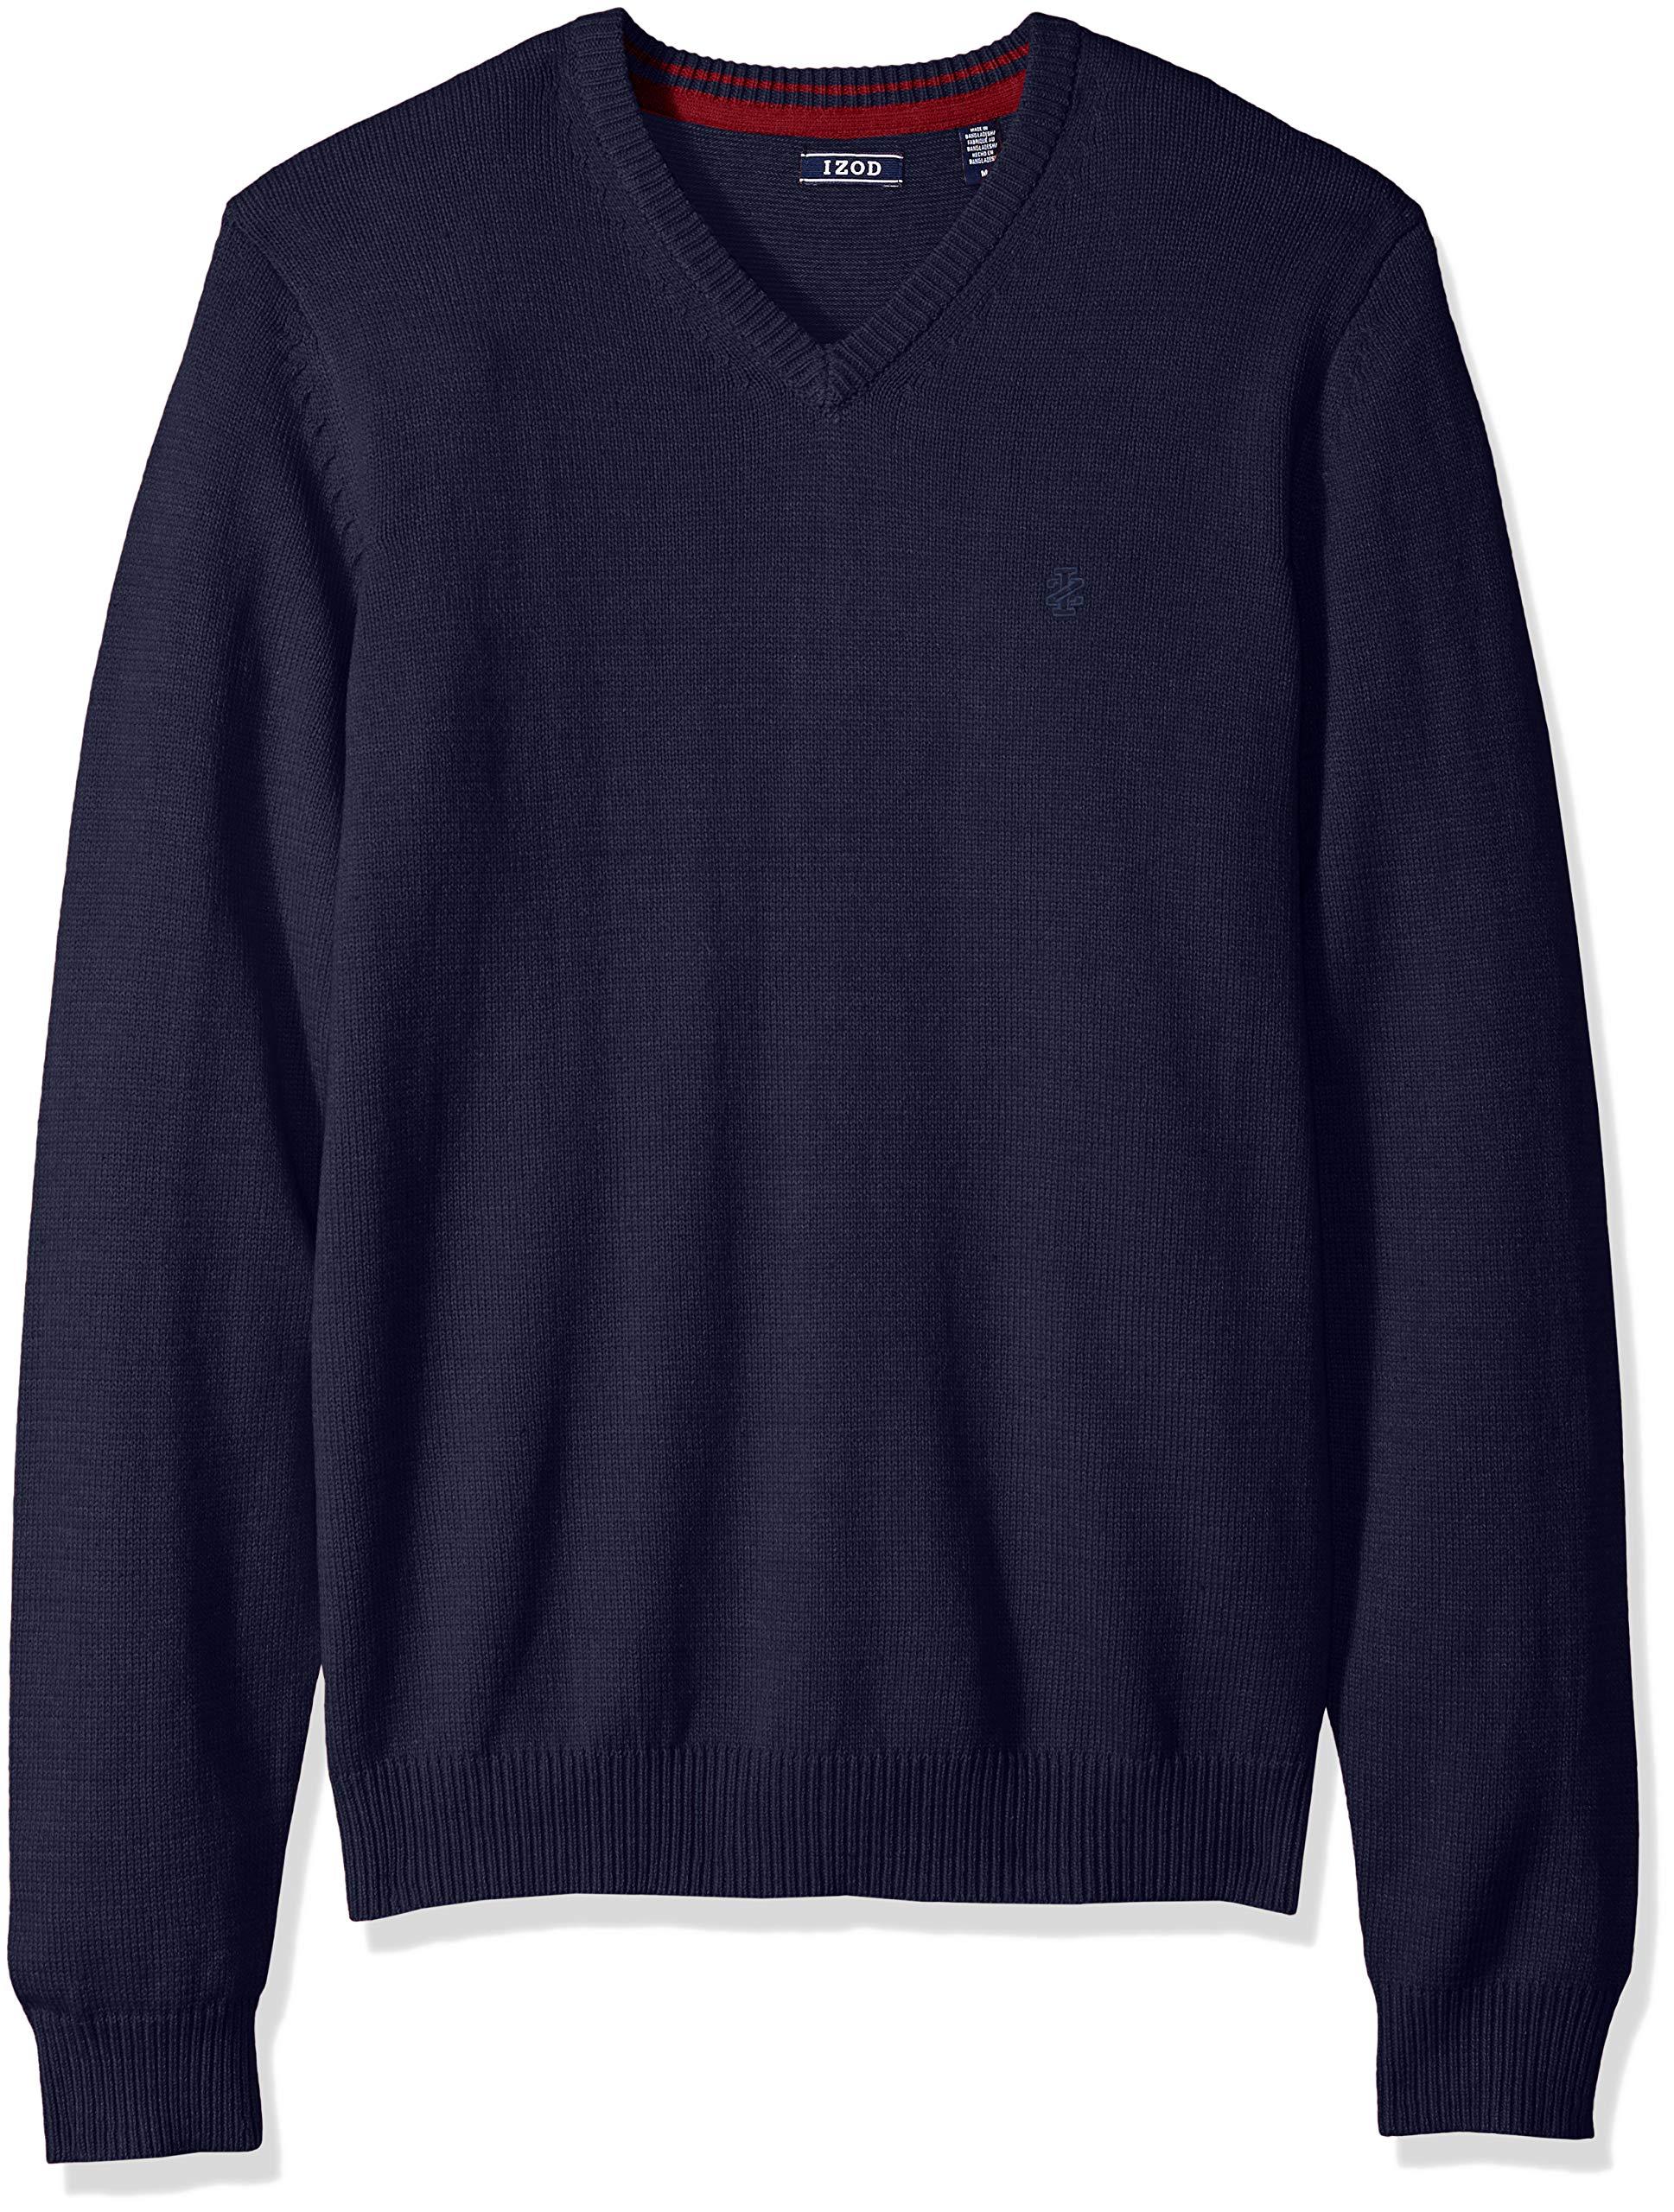 IZOD Men's Fine Gauge Solid V-Neck Sweater, New Peacoat, X-Large by IZOD (Image #1)